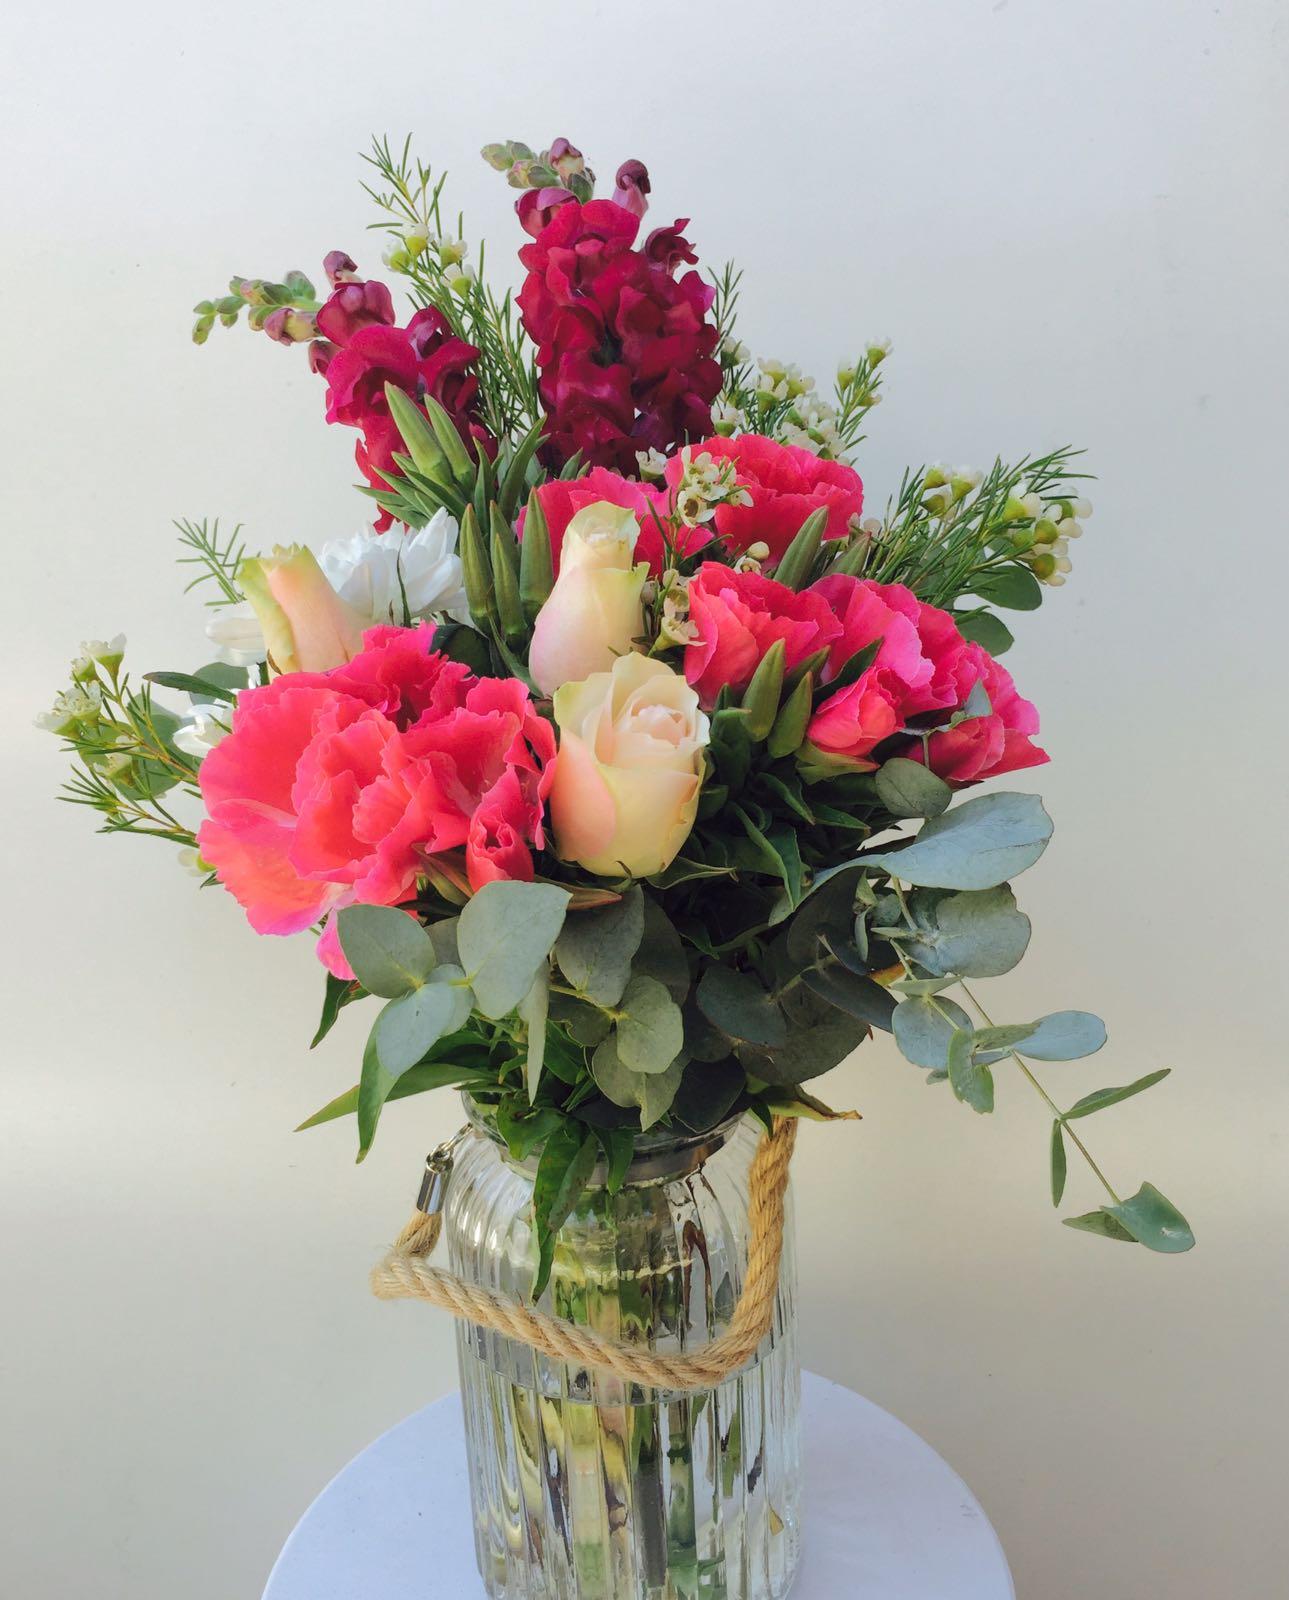 Online Vibrant Flowers Vase Melbourne